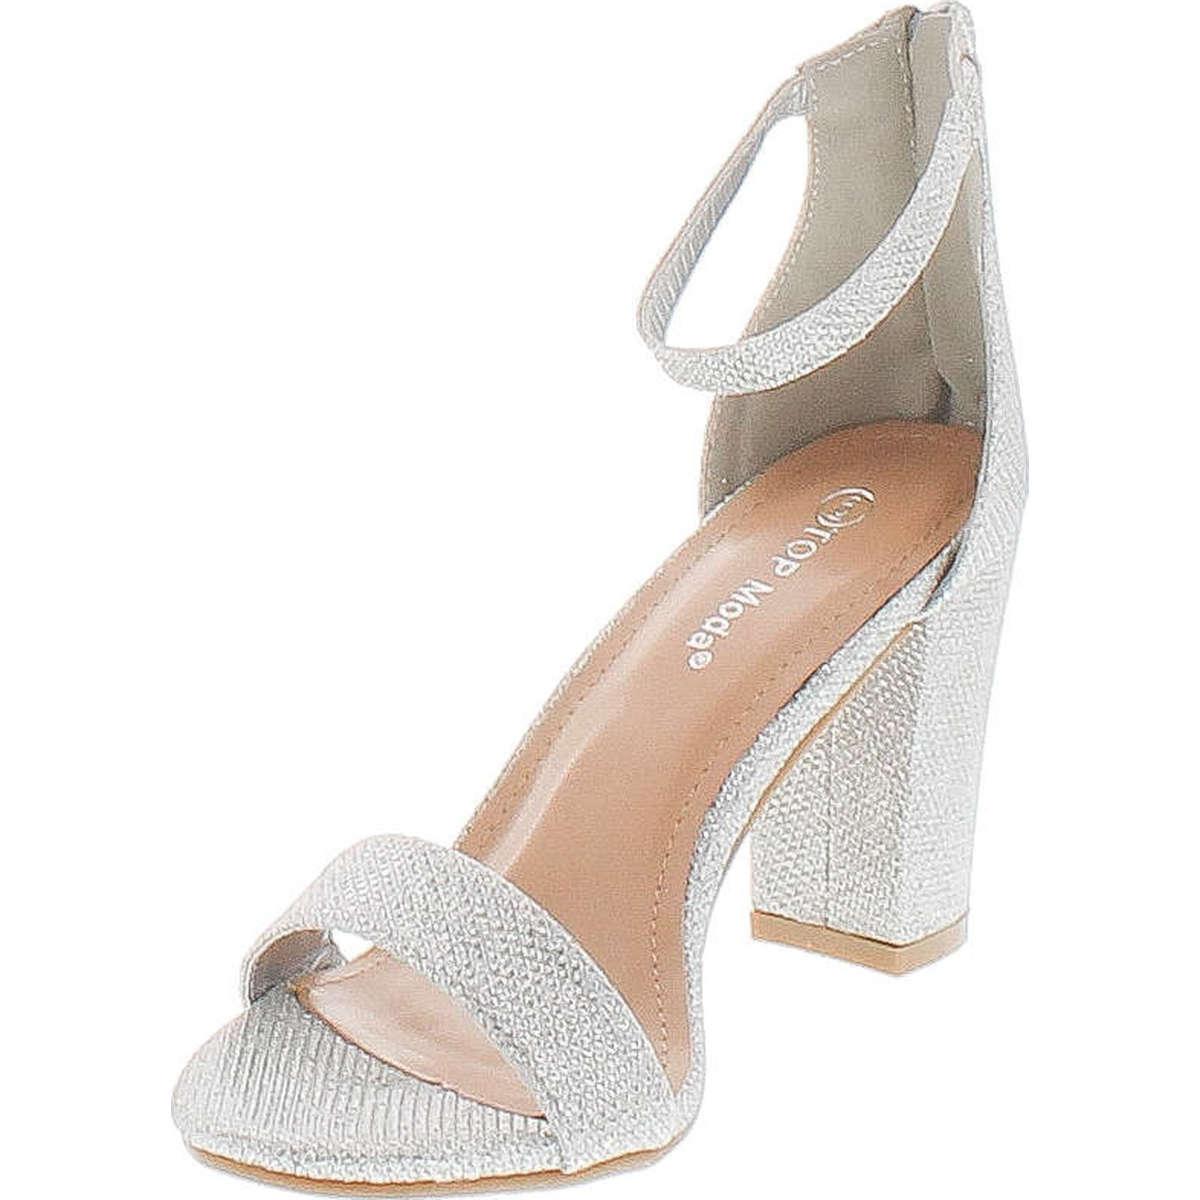 4e196155b21 Top Moda Womens Hannah-1 Platform Chunky Heel Metallic Glitter Party Ankle  Strap High Heel Sandal - ShoeCenter.com